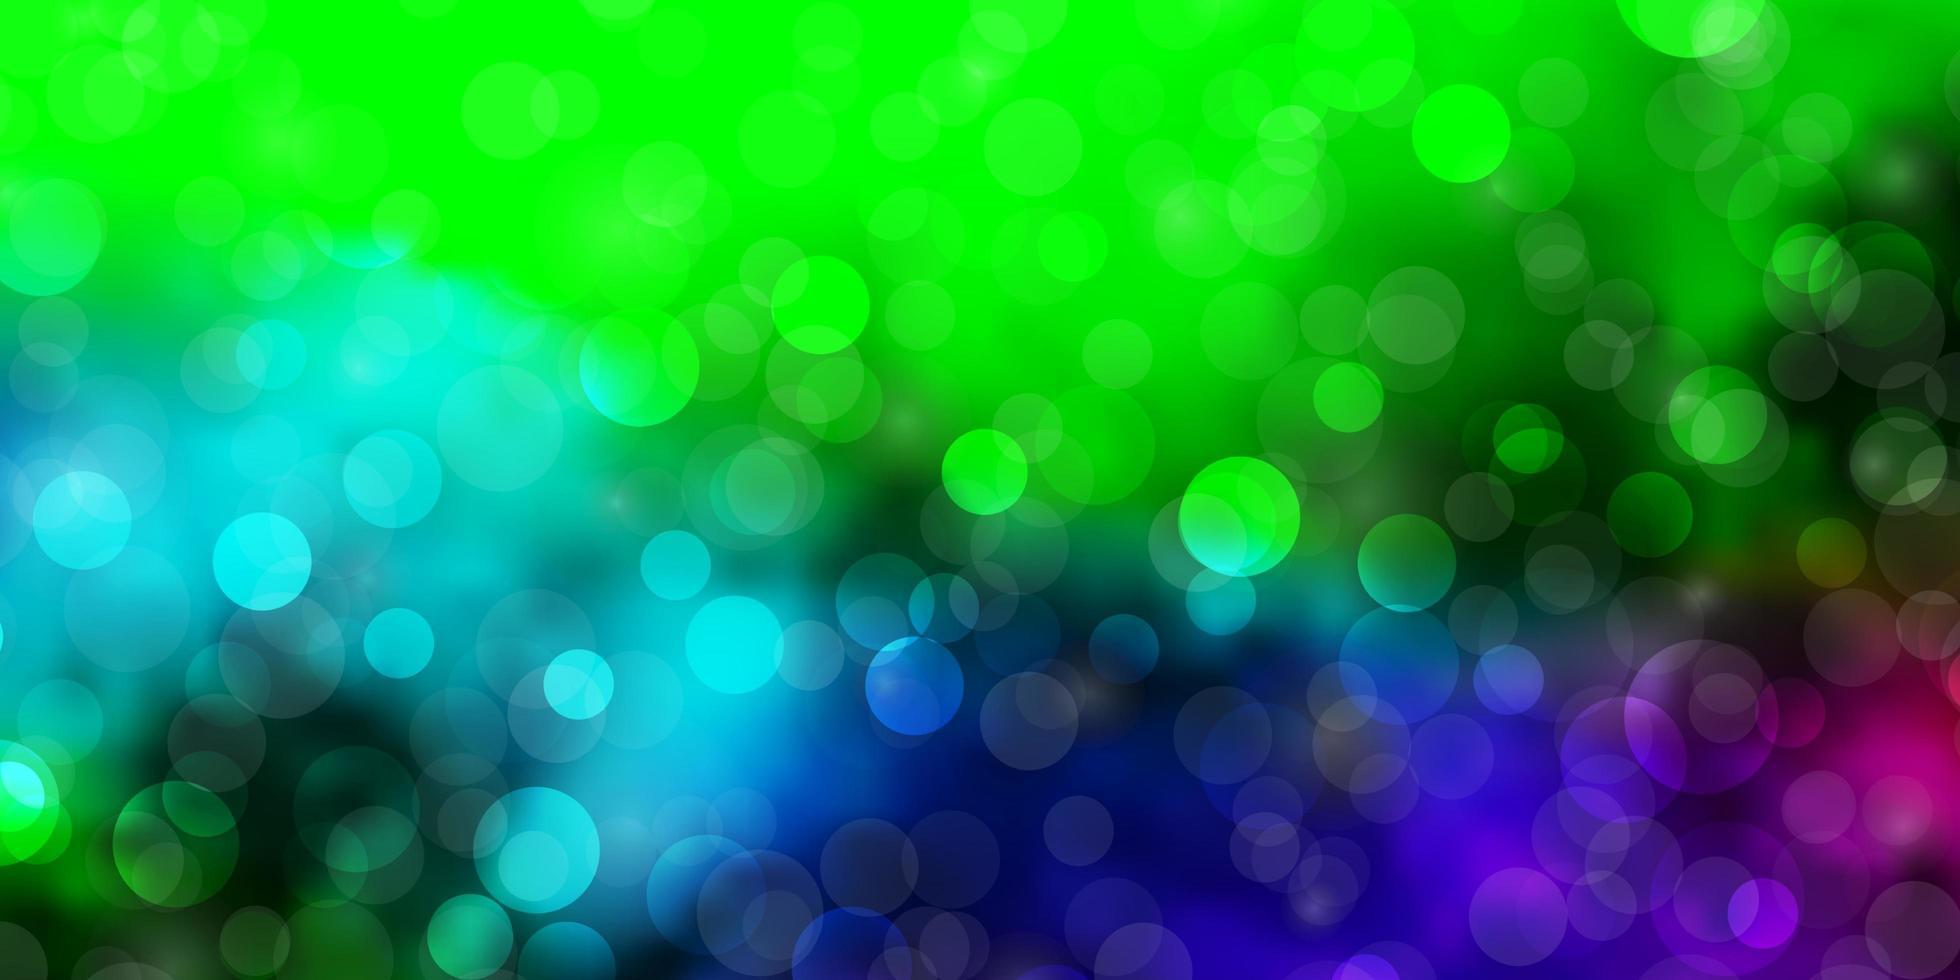 padrão de vetor multicolor escuro com círculos.